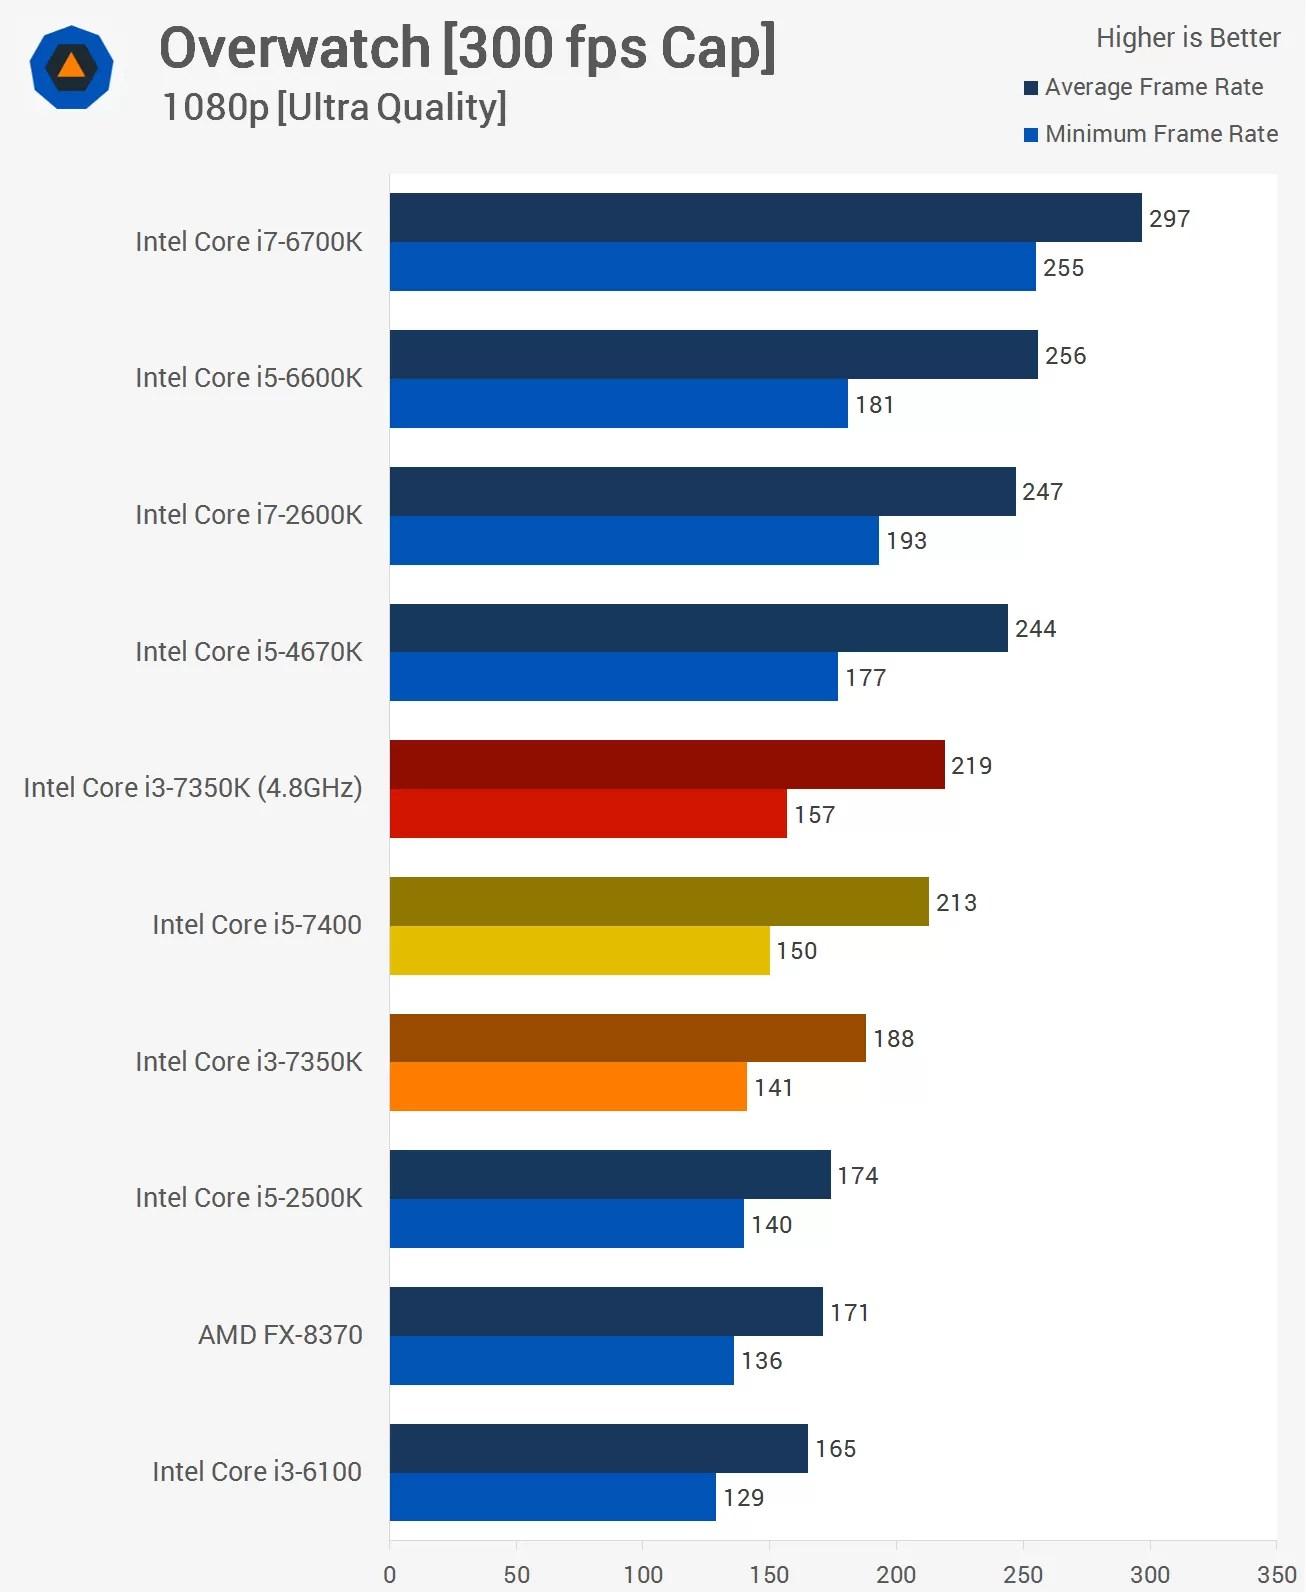 Intel Core I3 7350K Vs Core I5 7400 Gt Benchmarks Gaming